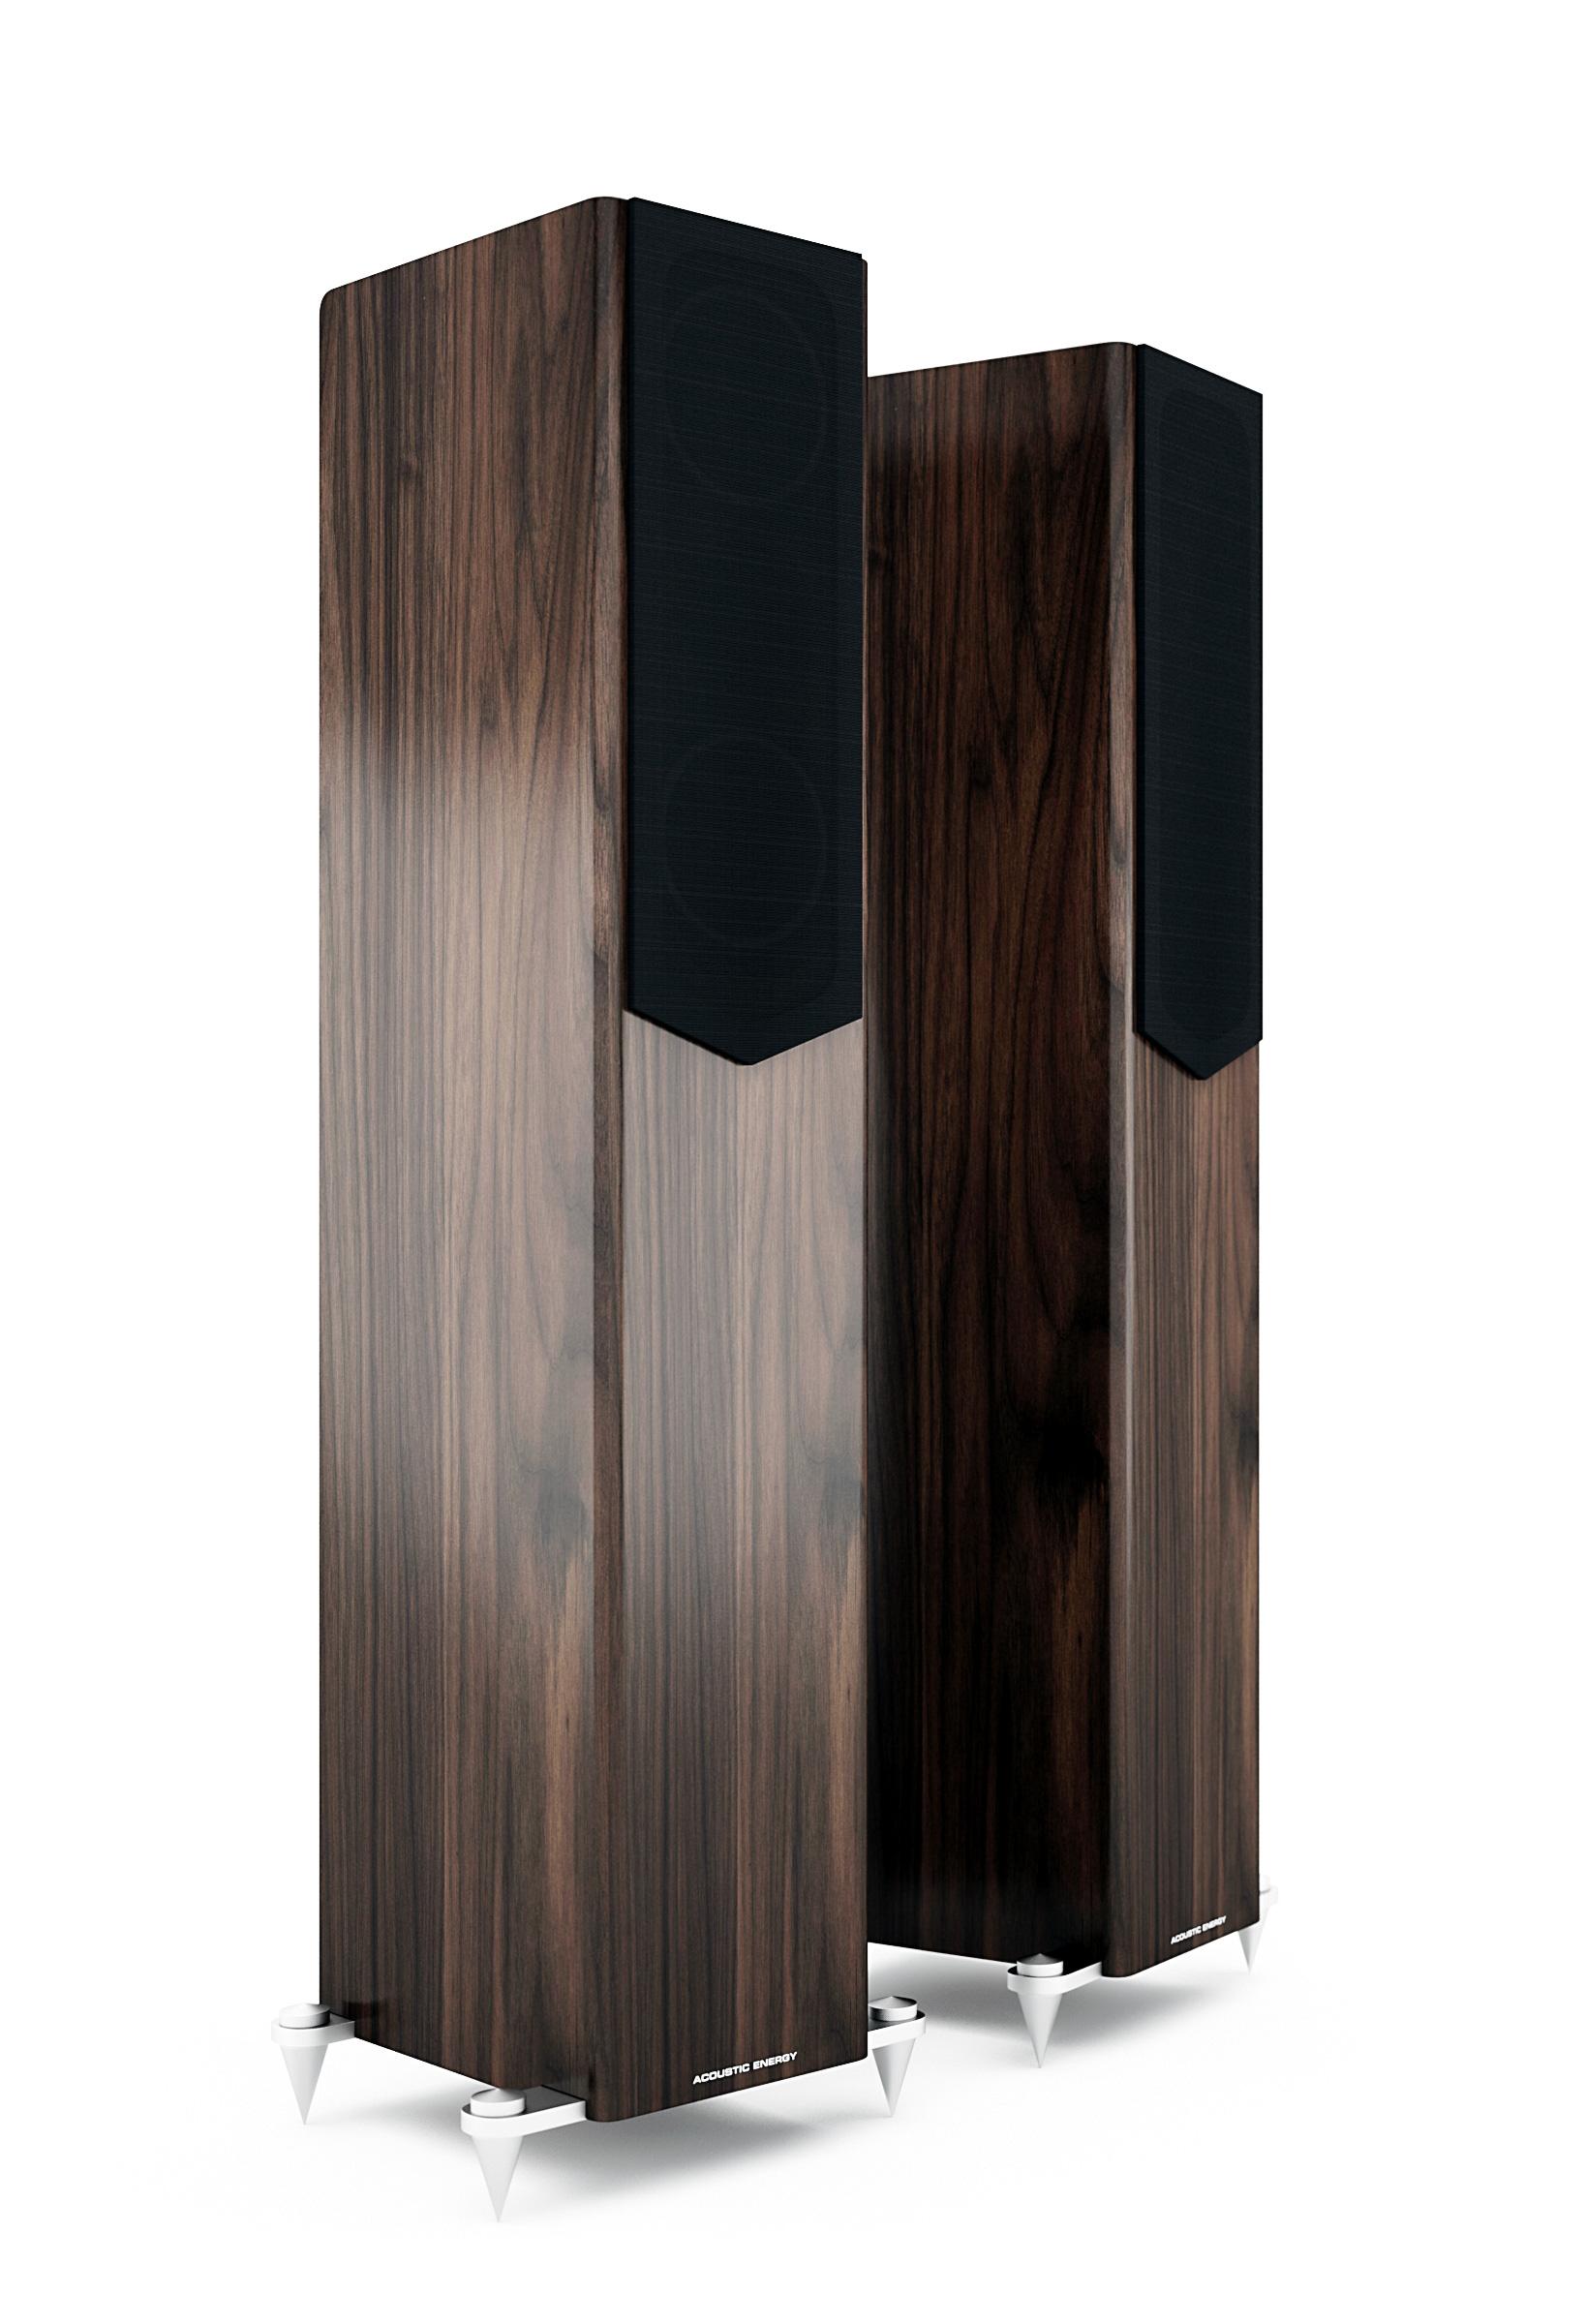 Acoustic Energy AE509